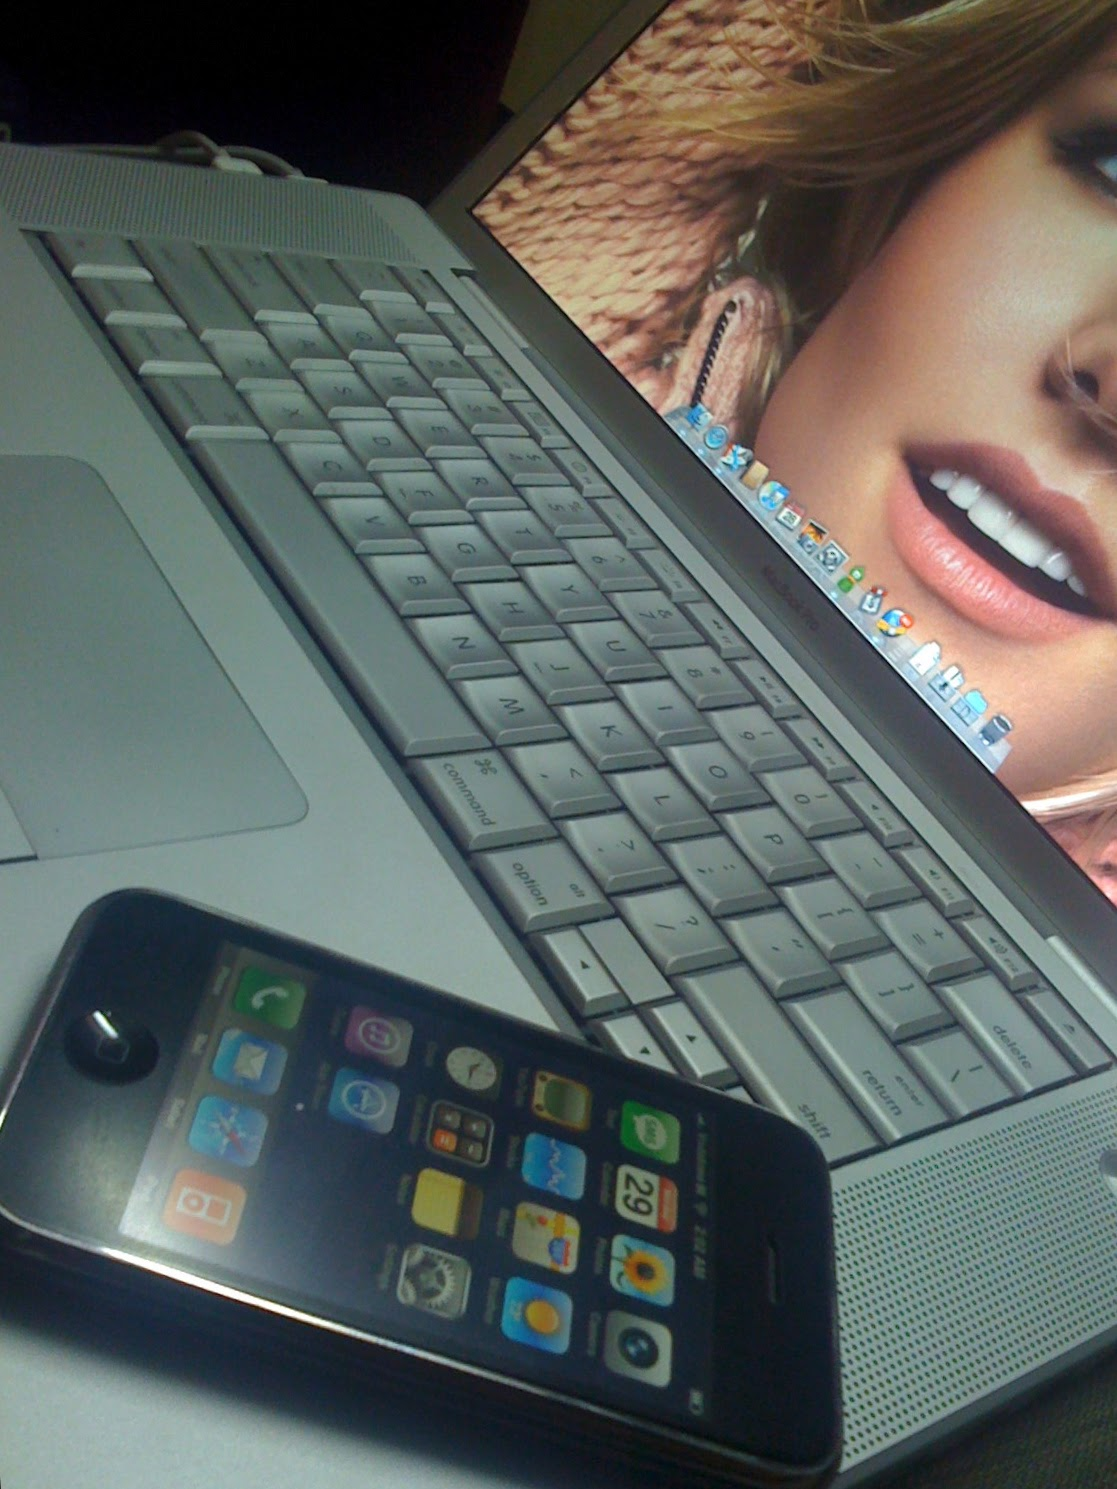 Preshit's MacBook Pro and iPhone